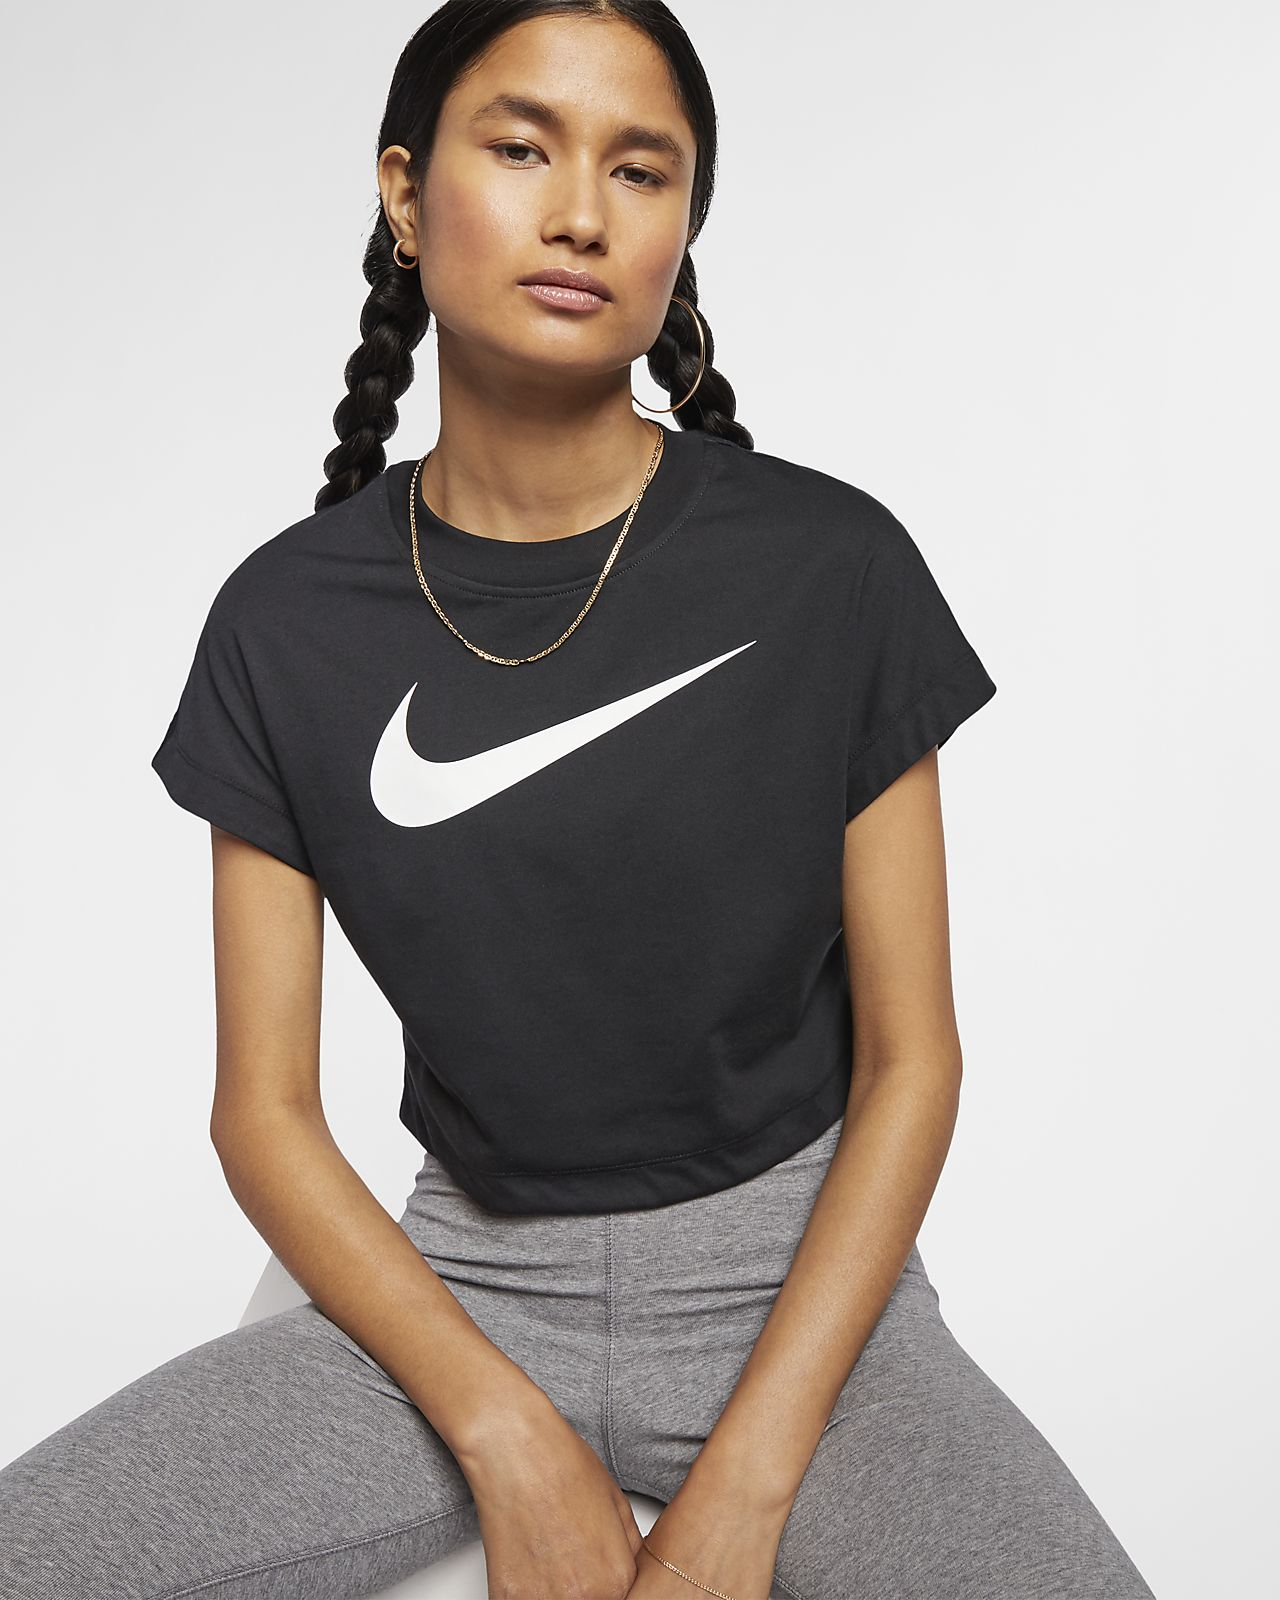 837e379815 Nike Sportswear Women s Swoosh Short-Sleeve Crop Top. Nike.com LU